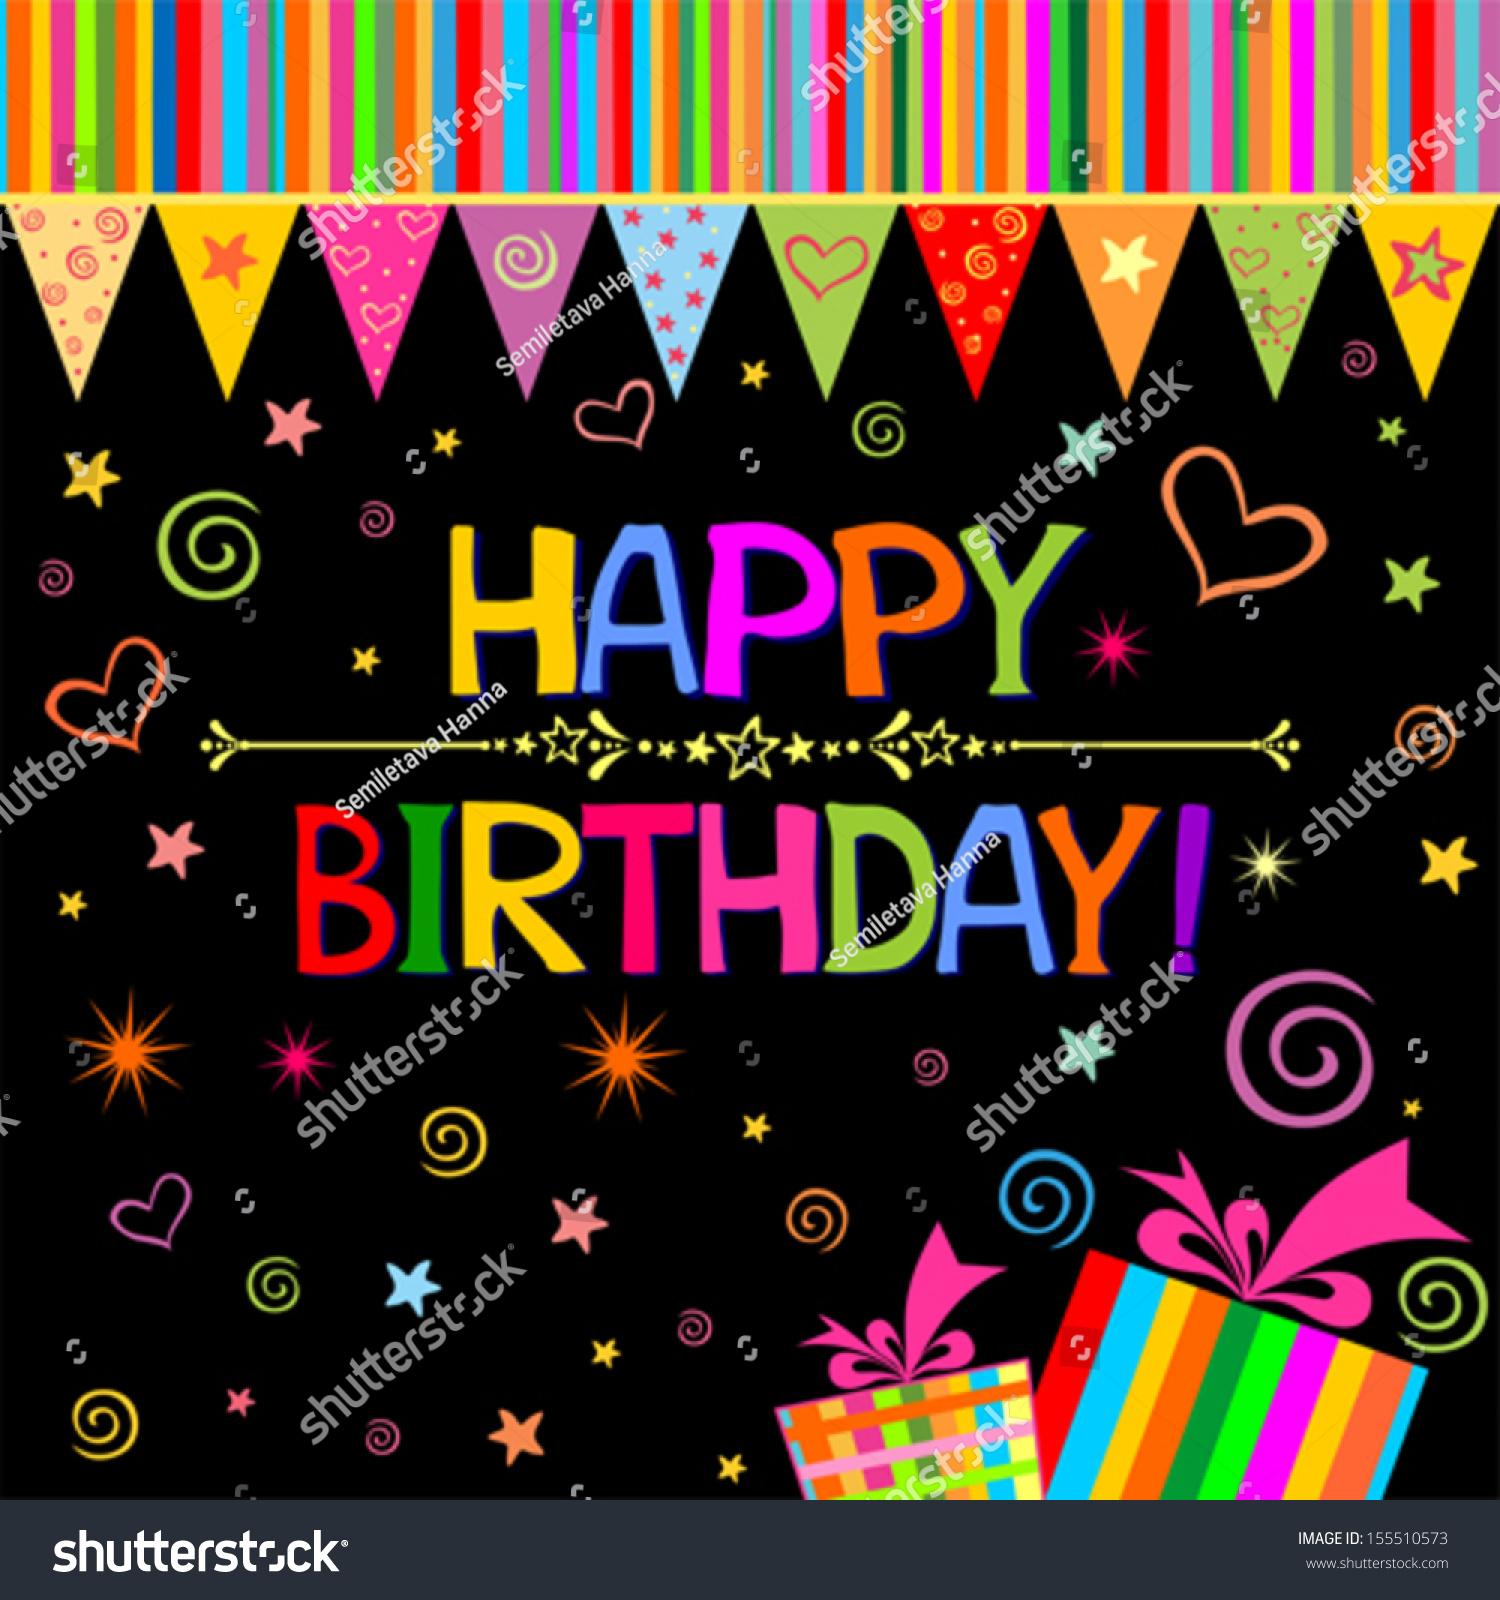 Happy Birthday Card. Celebration Black Background With